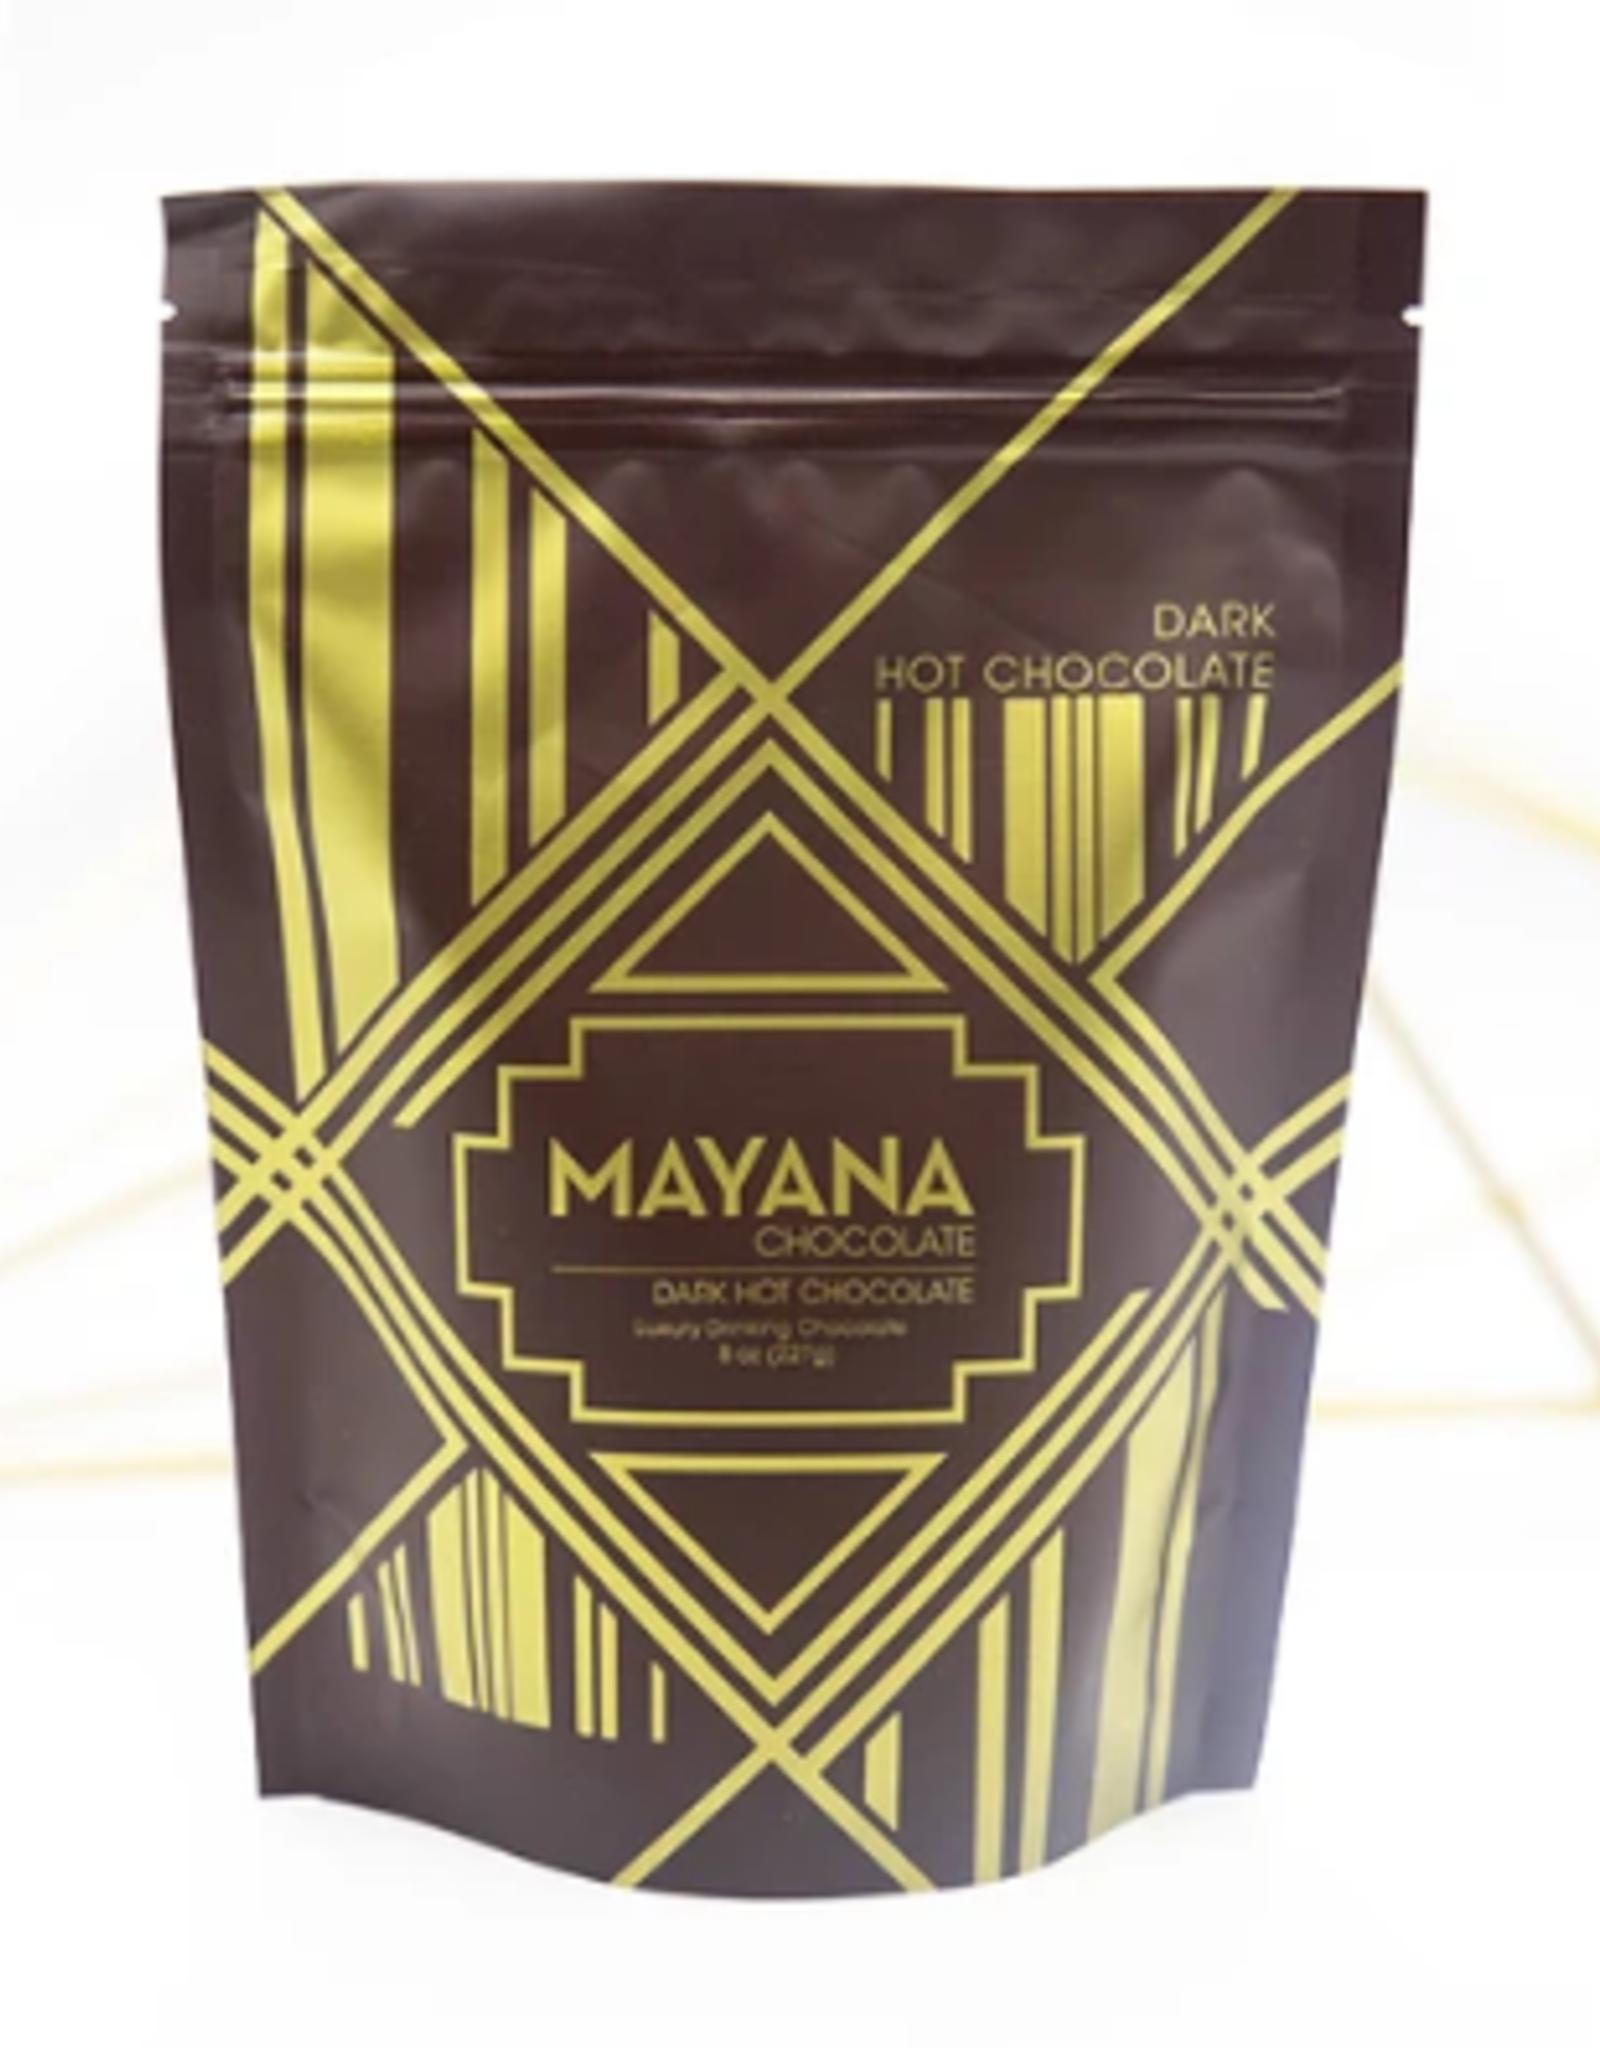 Mayana Chocolate Mayana Hot Chocolate, Dark